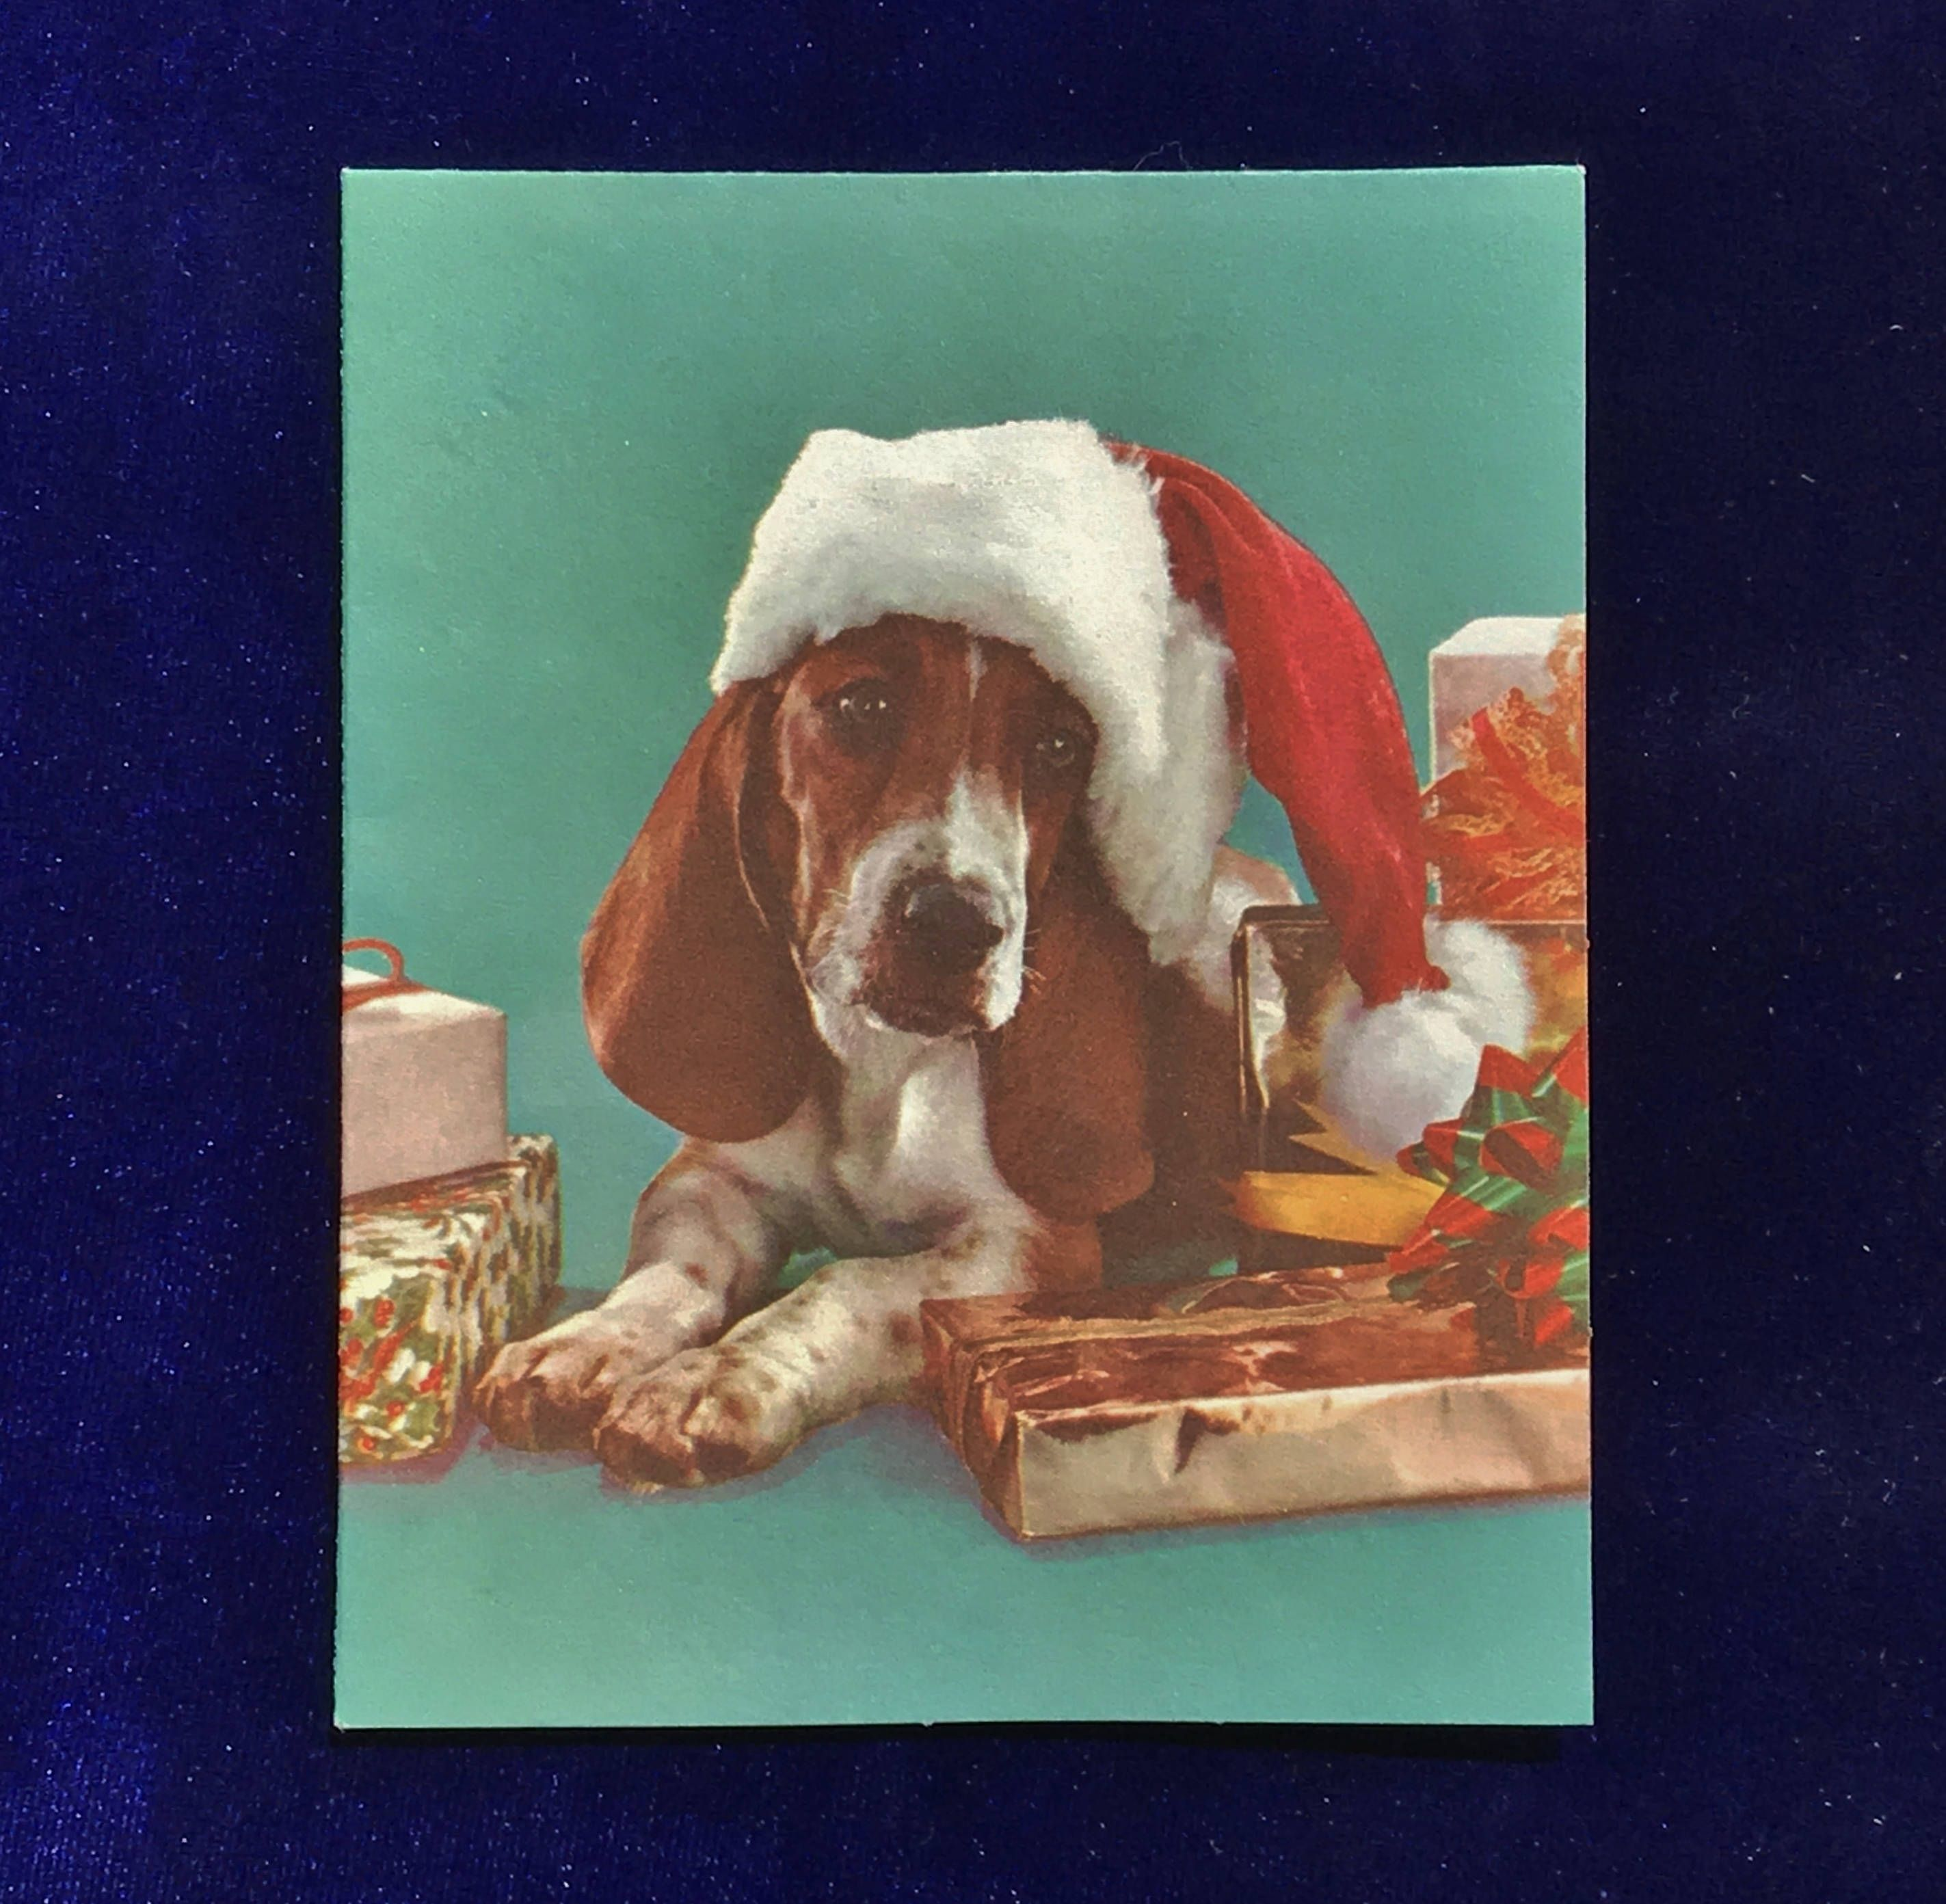 1966 Basset Hound Dog Santa Hat Christmas Card | Basset hound